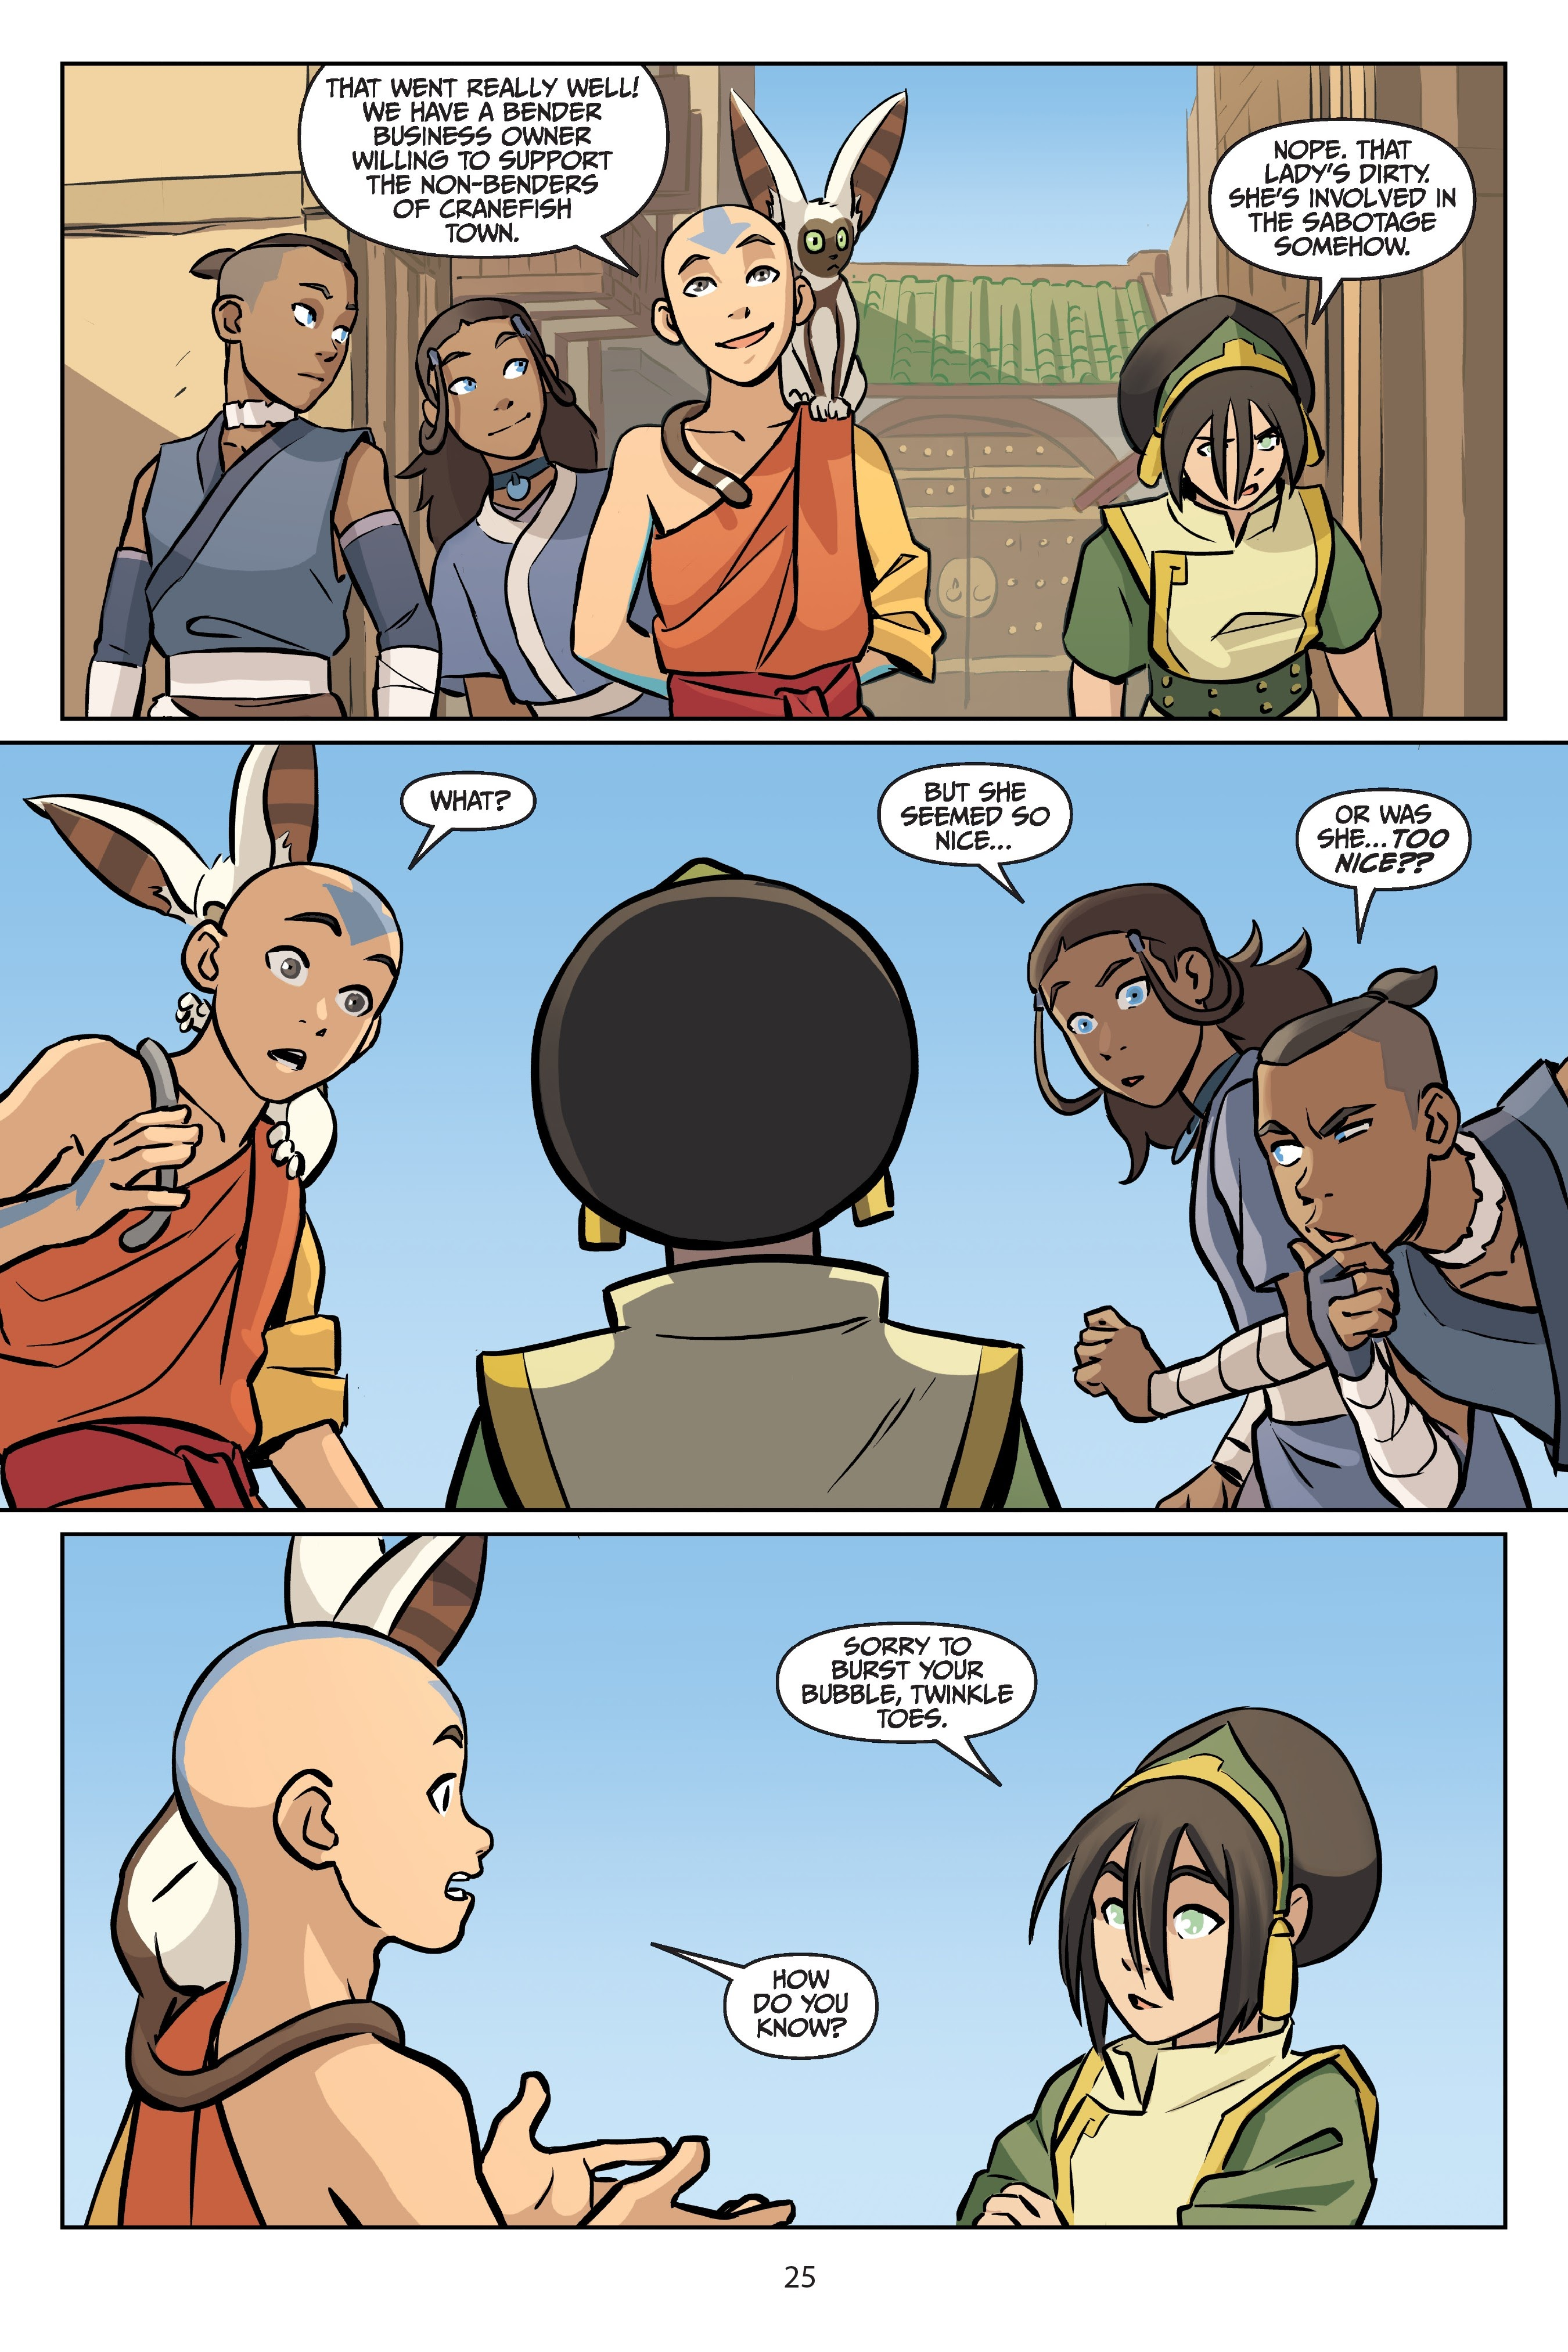 Nickelodeon Avatar: The Last Airbender - Imbalance TPB_2 Page 25